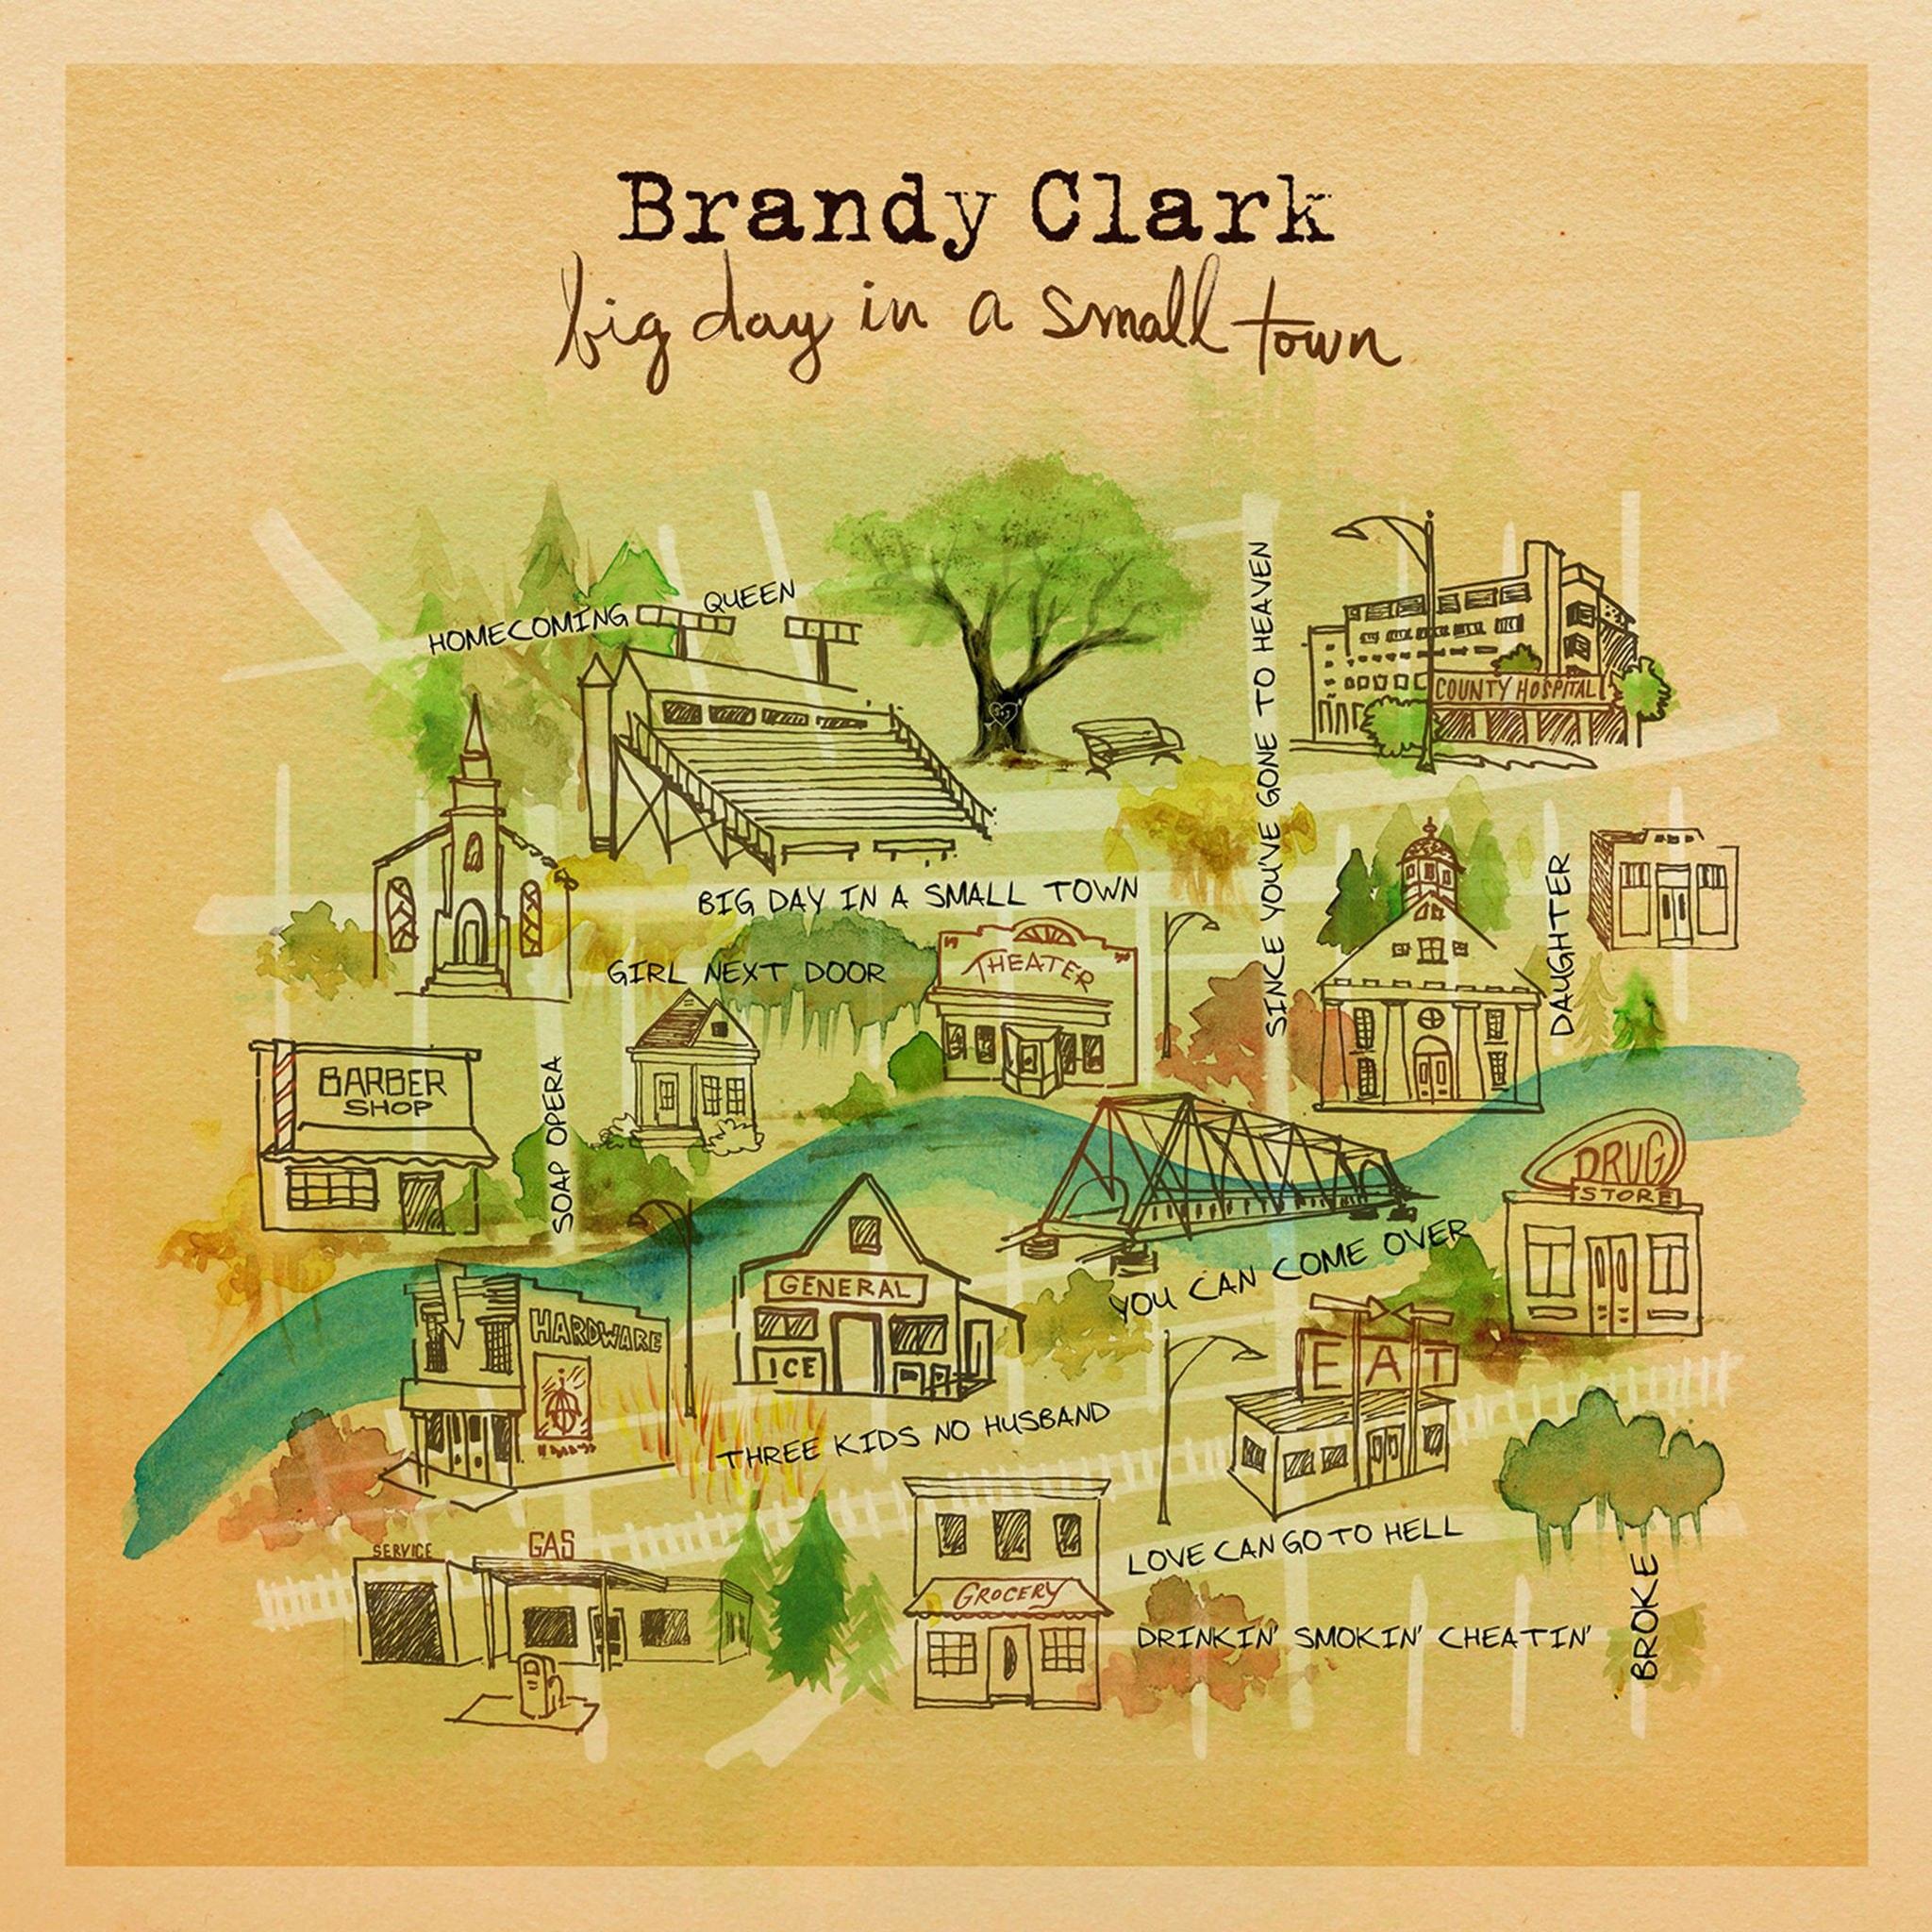 2016_06_brandy-clark-big-day-in-a-small-townjpg-0bf9273e7dc5bd90.jpg